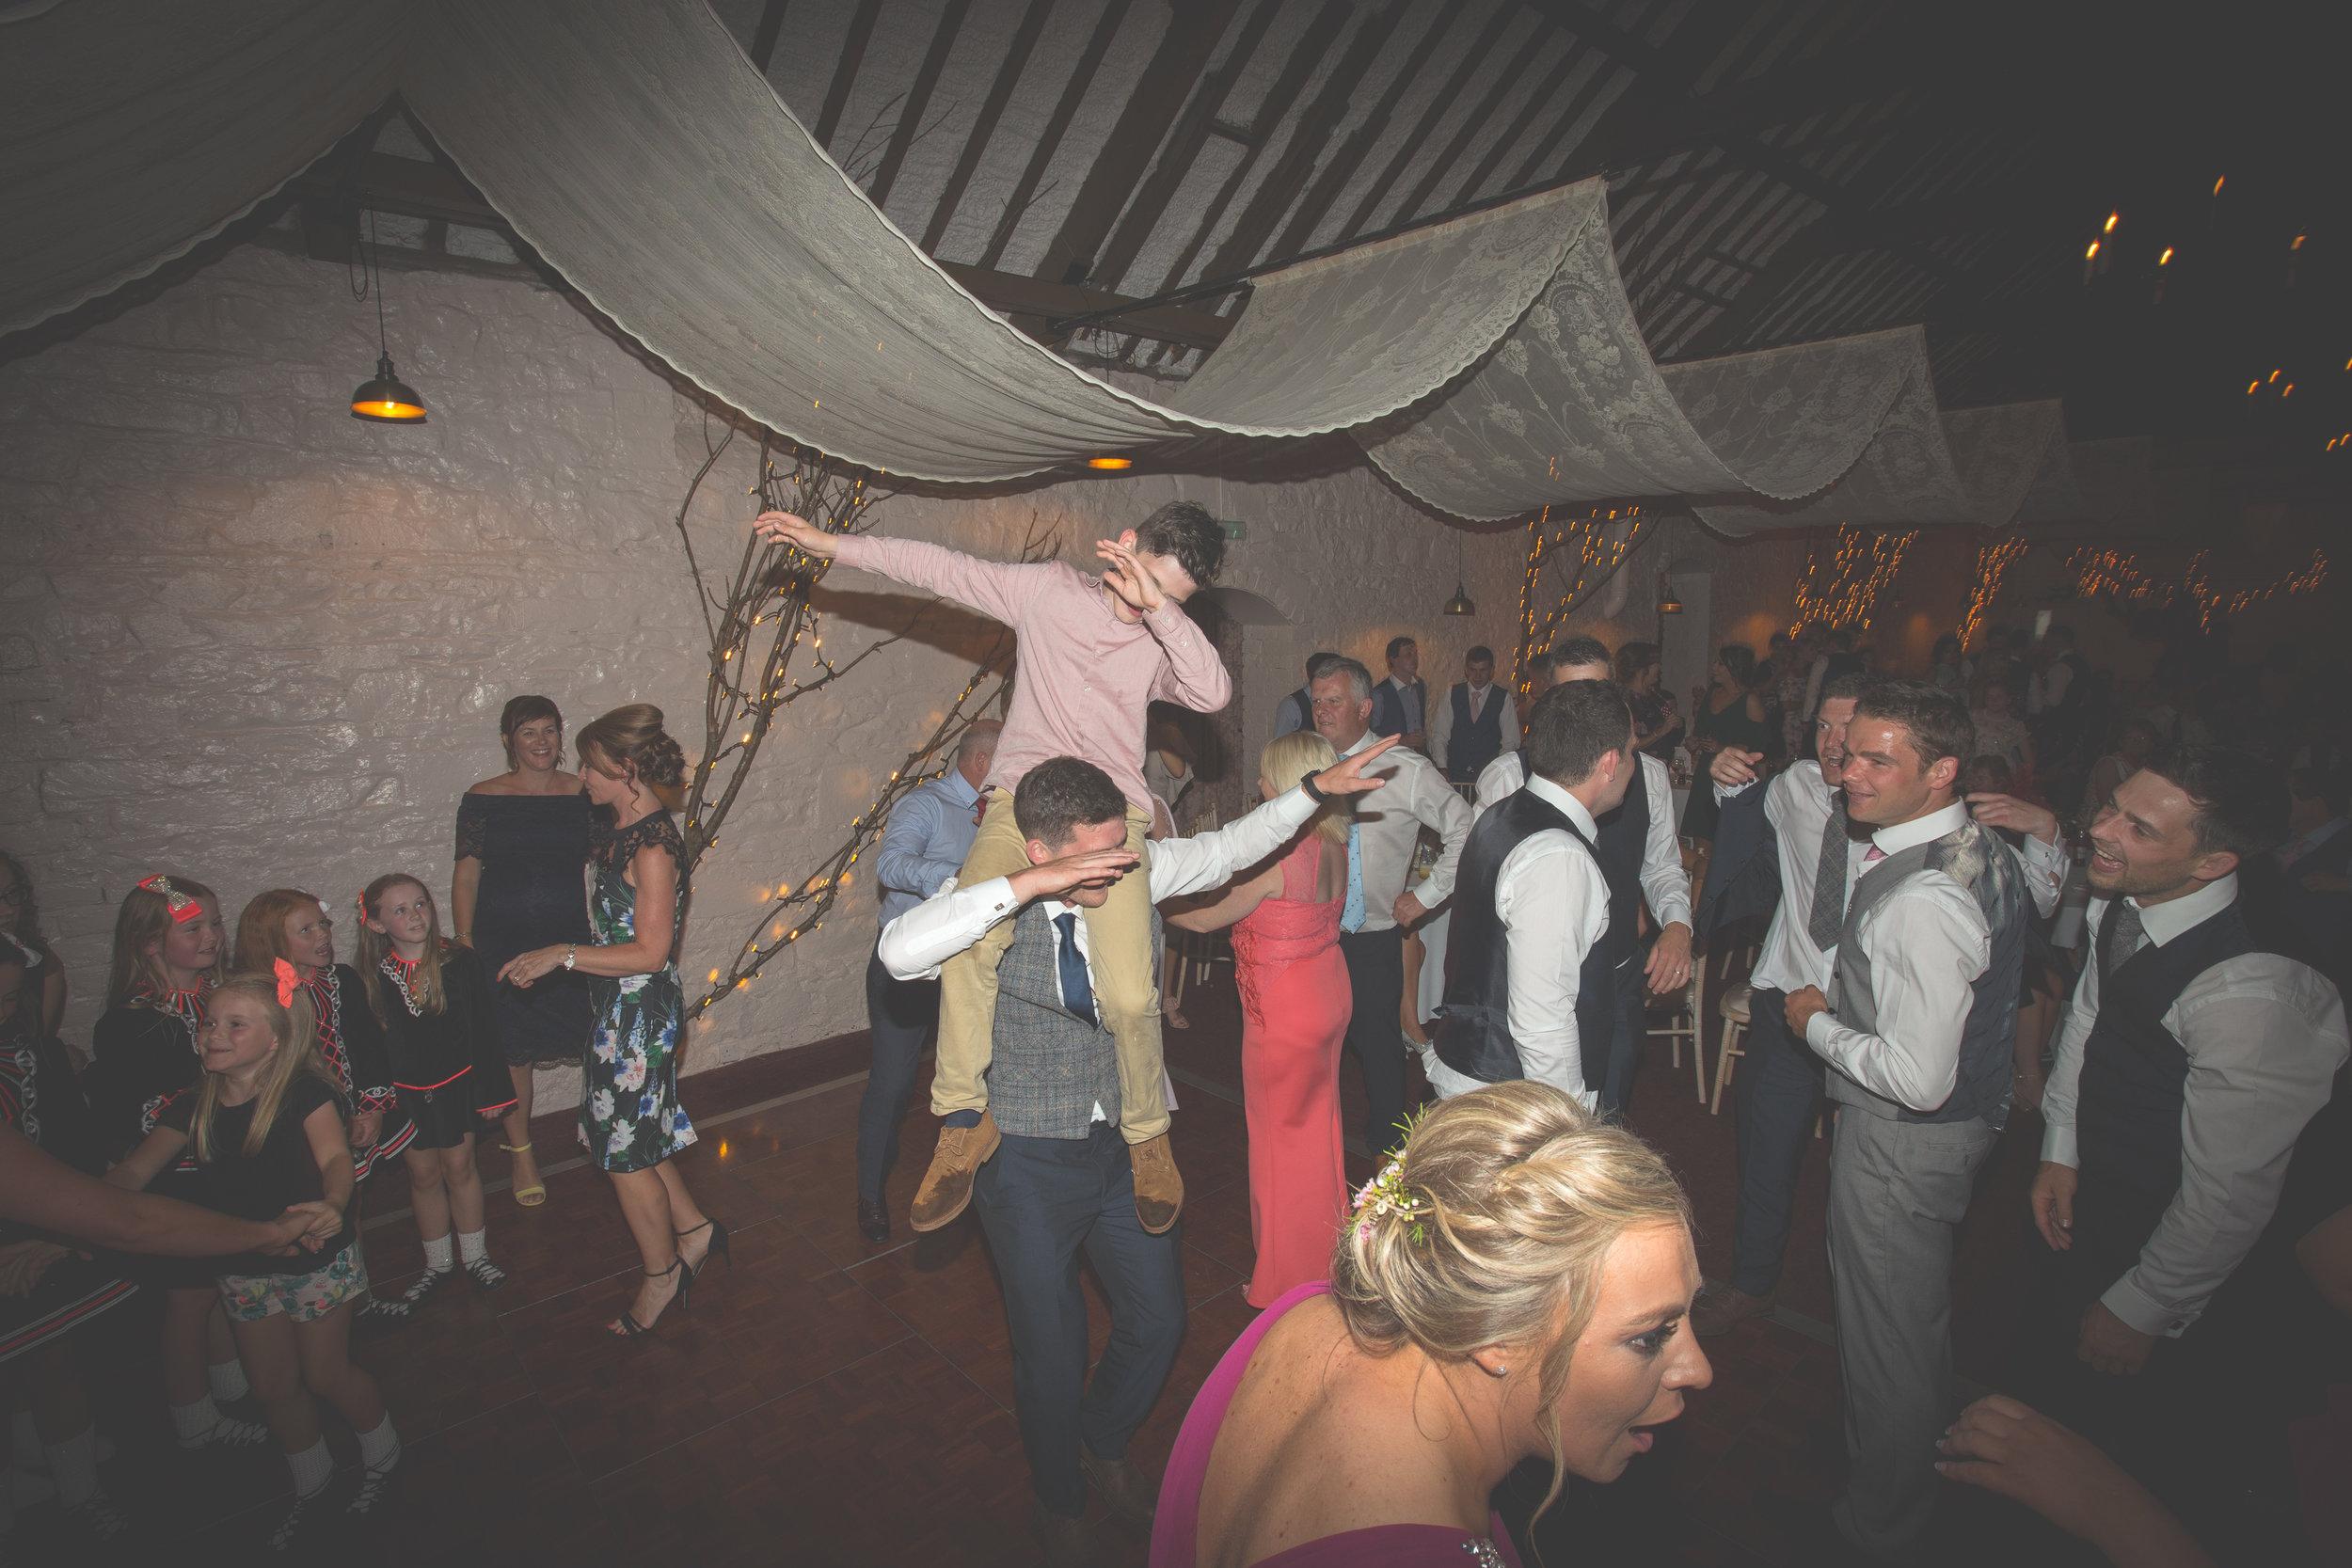 Brian McEwan Wedding Photography | Carol-Annee & Sean | The Dancing-72.jpg